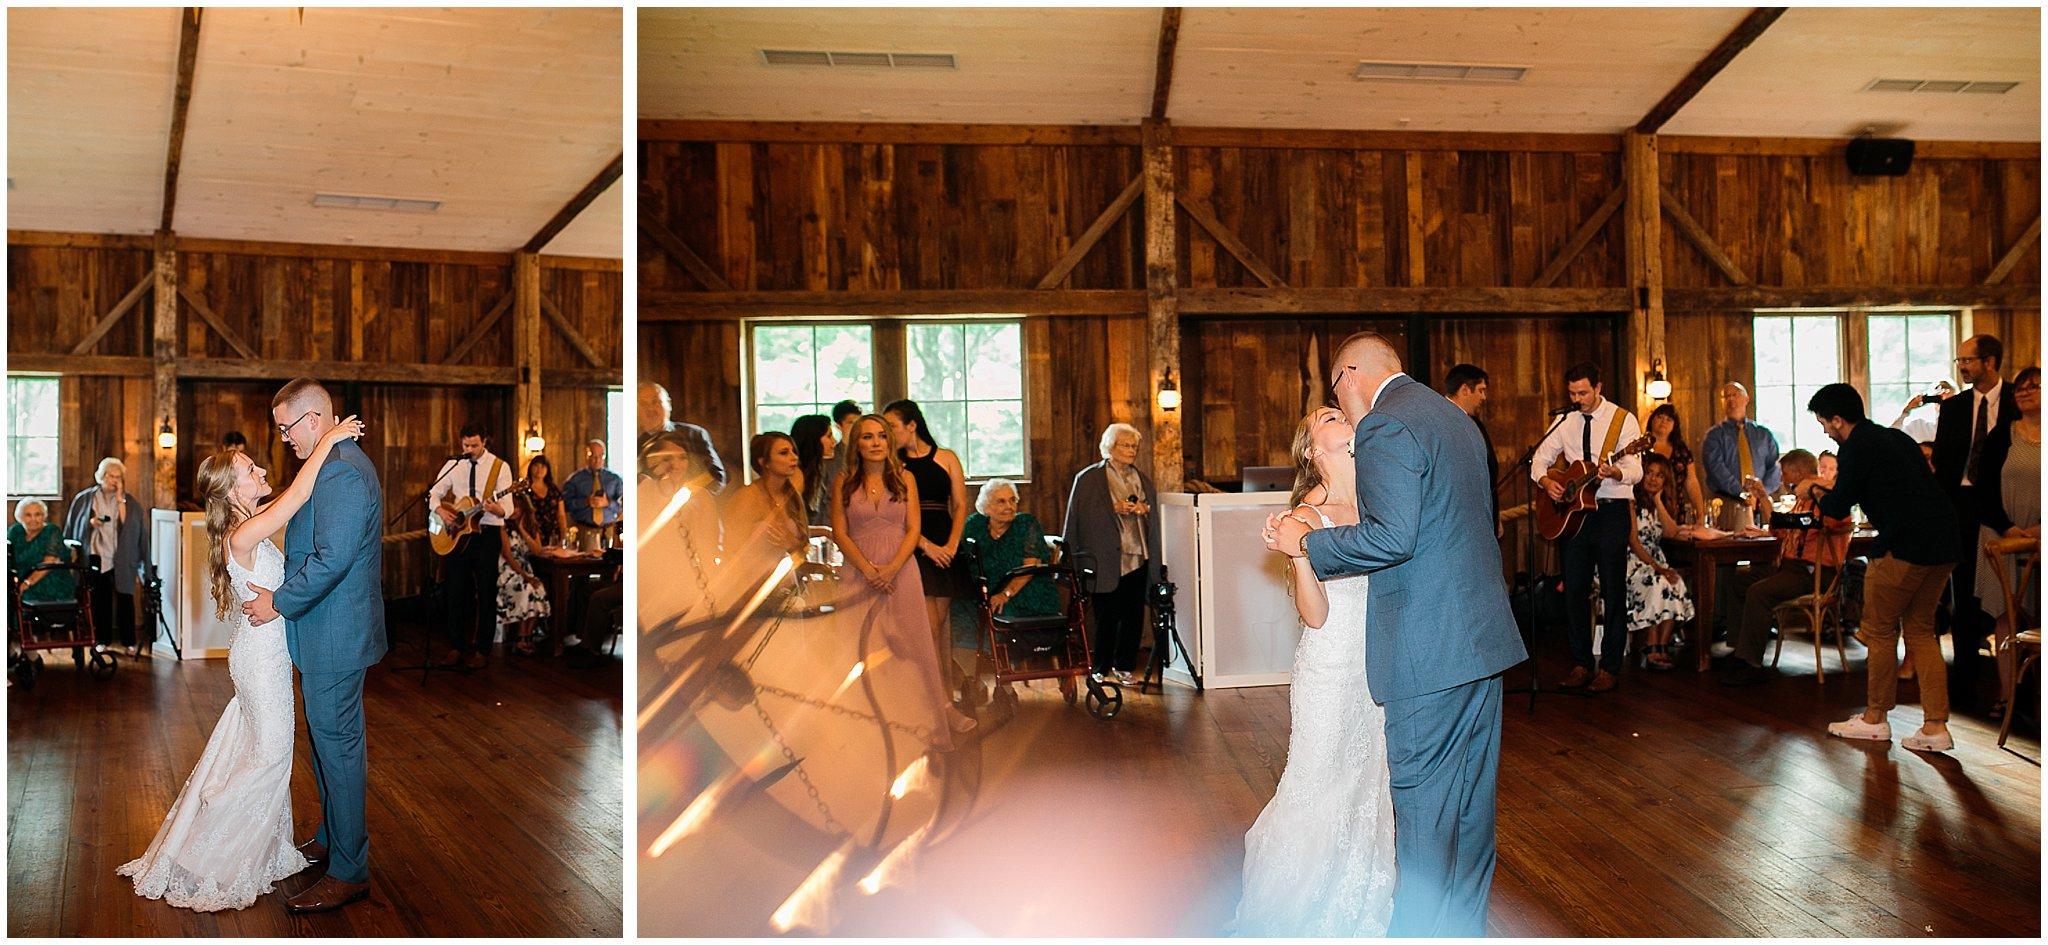 Preston Barn Old Drovers Inn Wedding Rustic Wedding Hudson Valley Photographer Sweet Alice Photography76.jpg